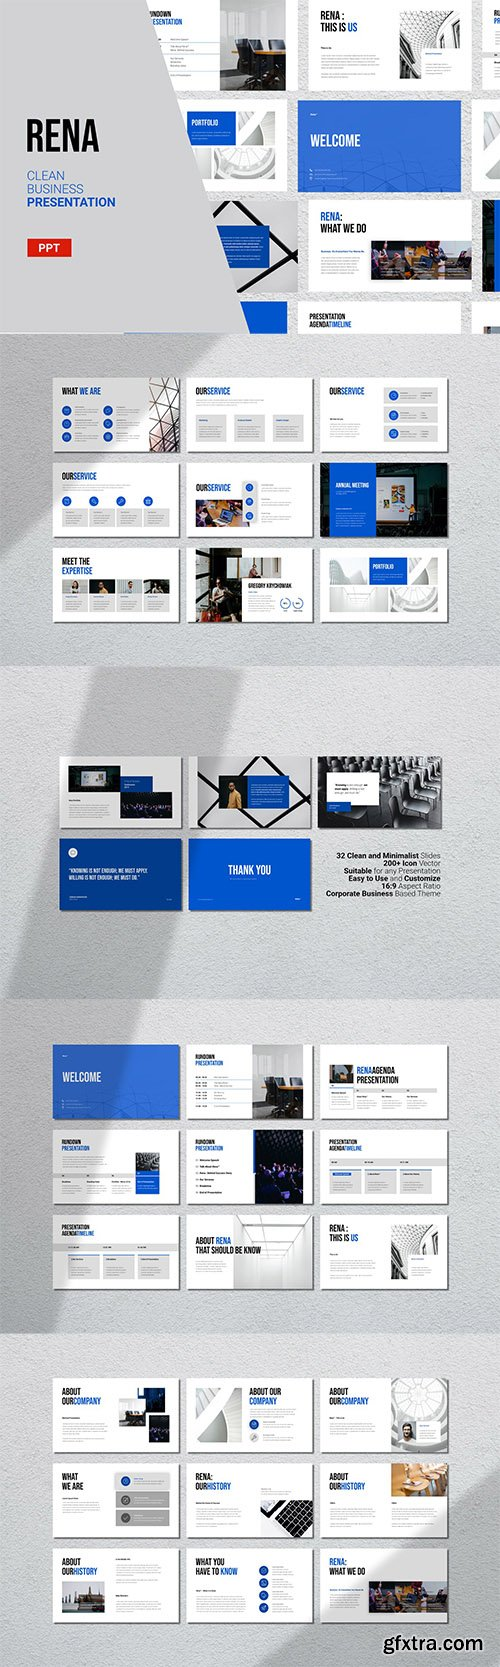 Rena - Clean Powerpoint, Keynote and Google Slide Template